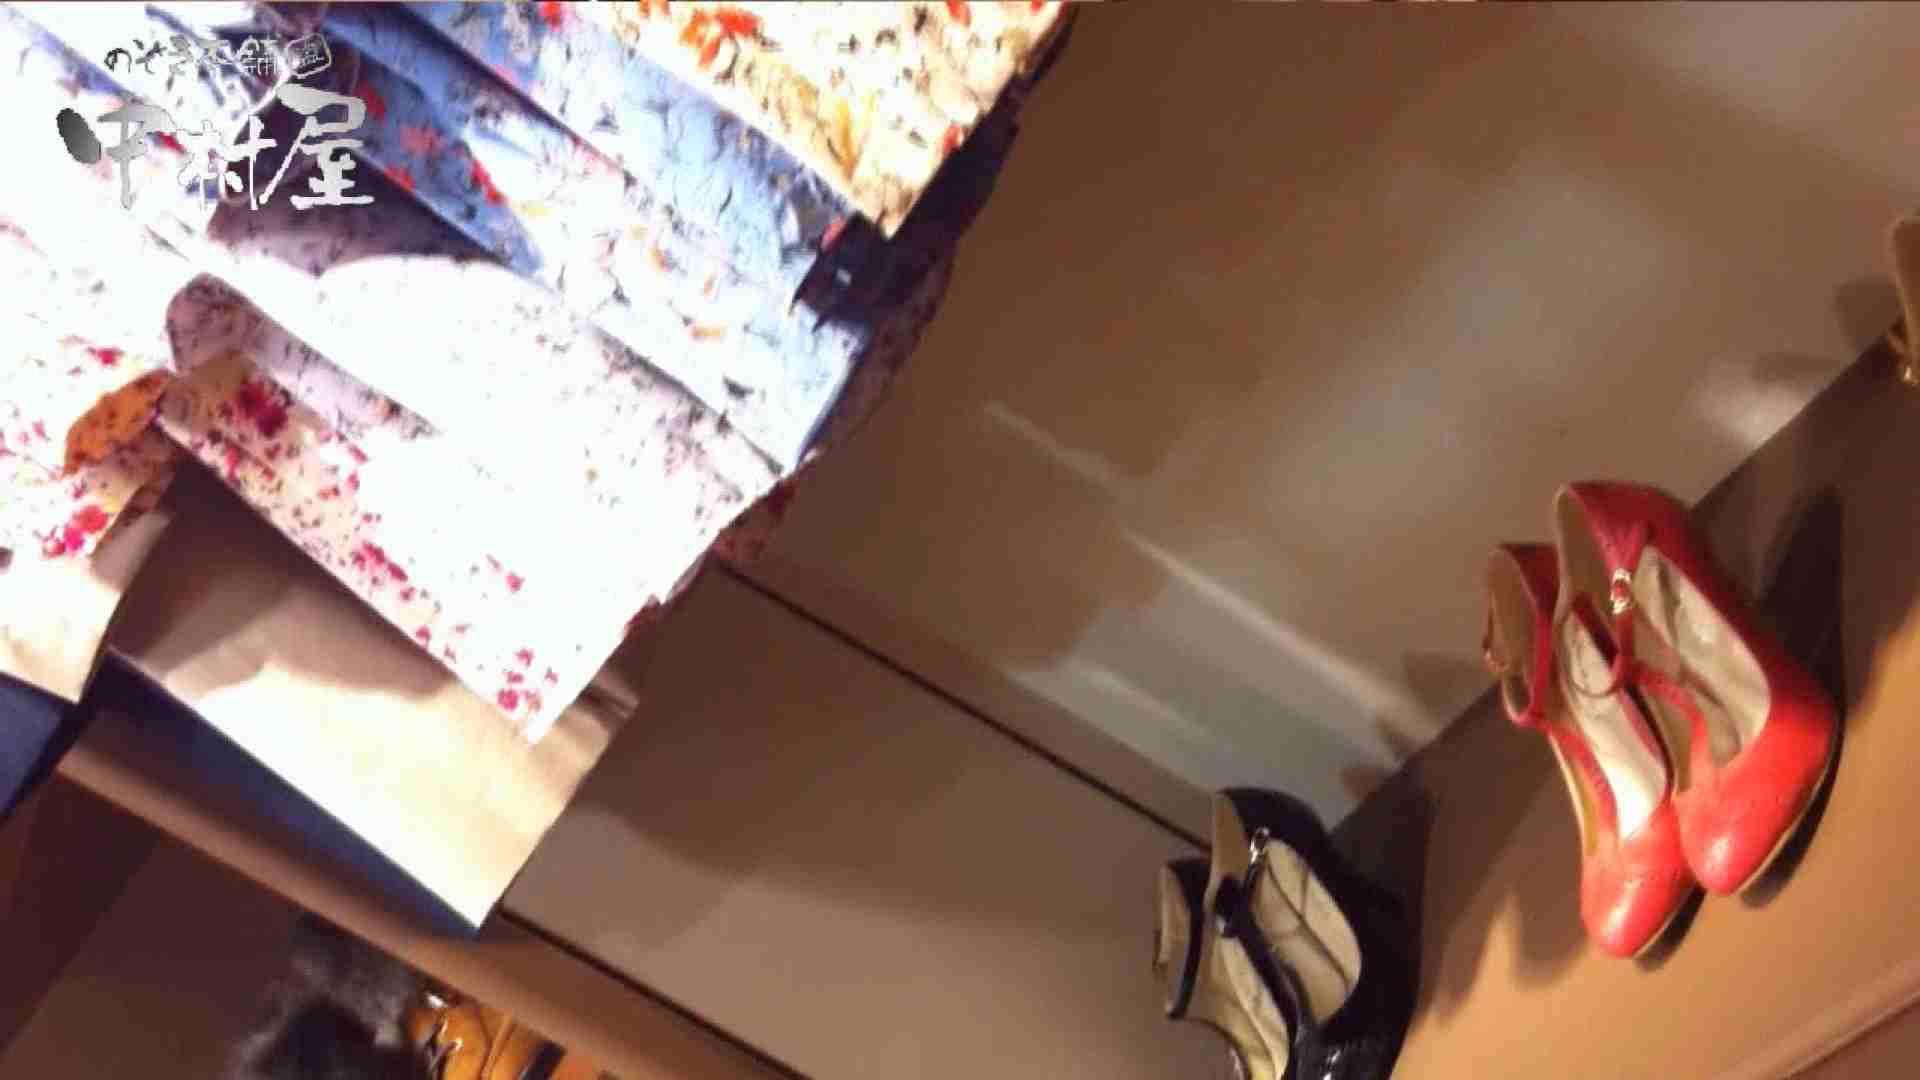 vol.57 美人アパレル胸チラ&パンチラ 激カワ店員のおっぱい 胸チラ ワレメ動画紹介 99pic 95